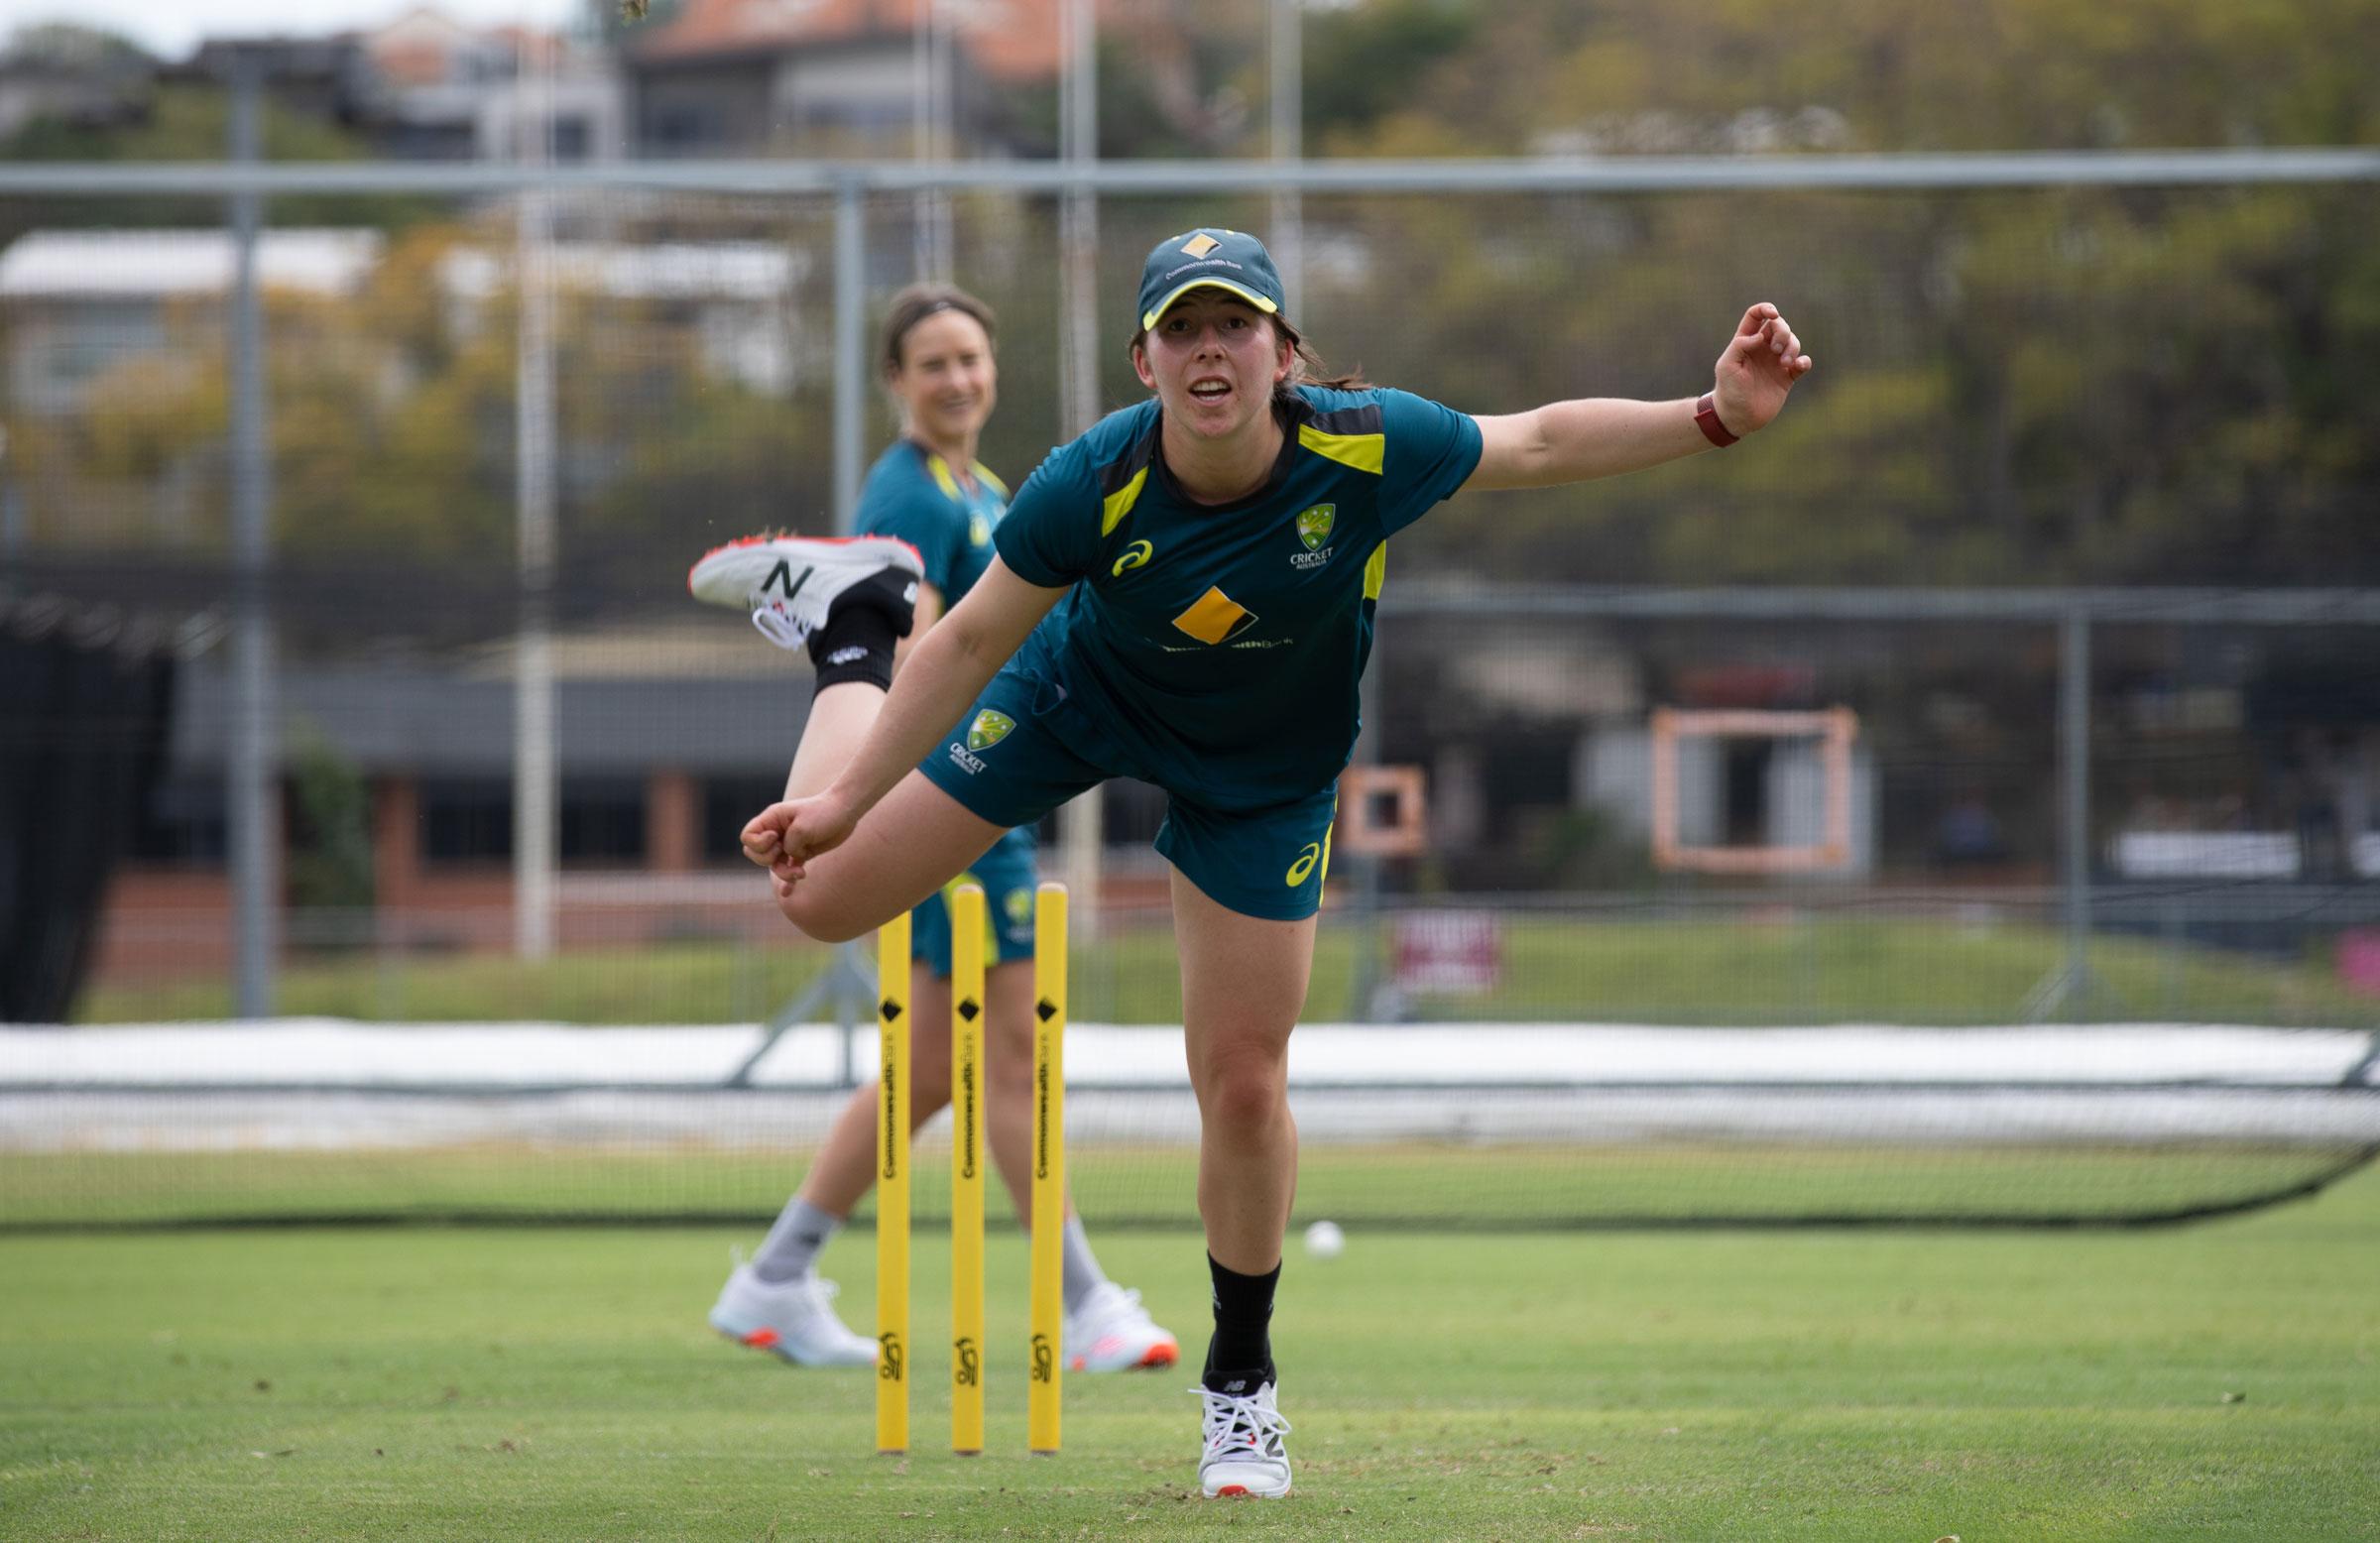 Georgia Wareham will be spinning a web for Australia // cricket.com.au